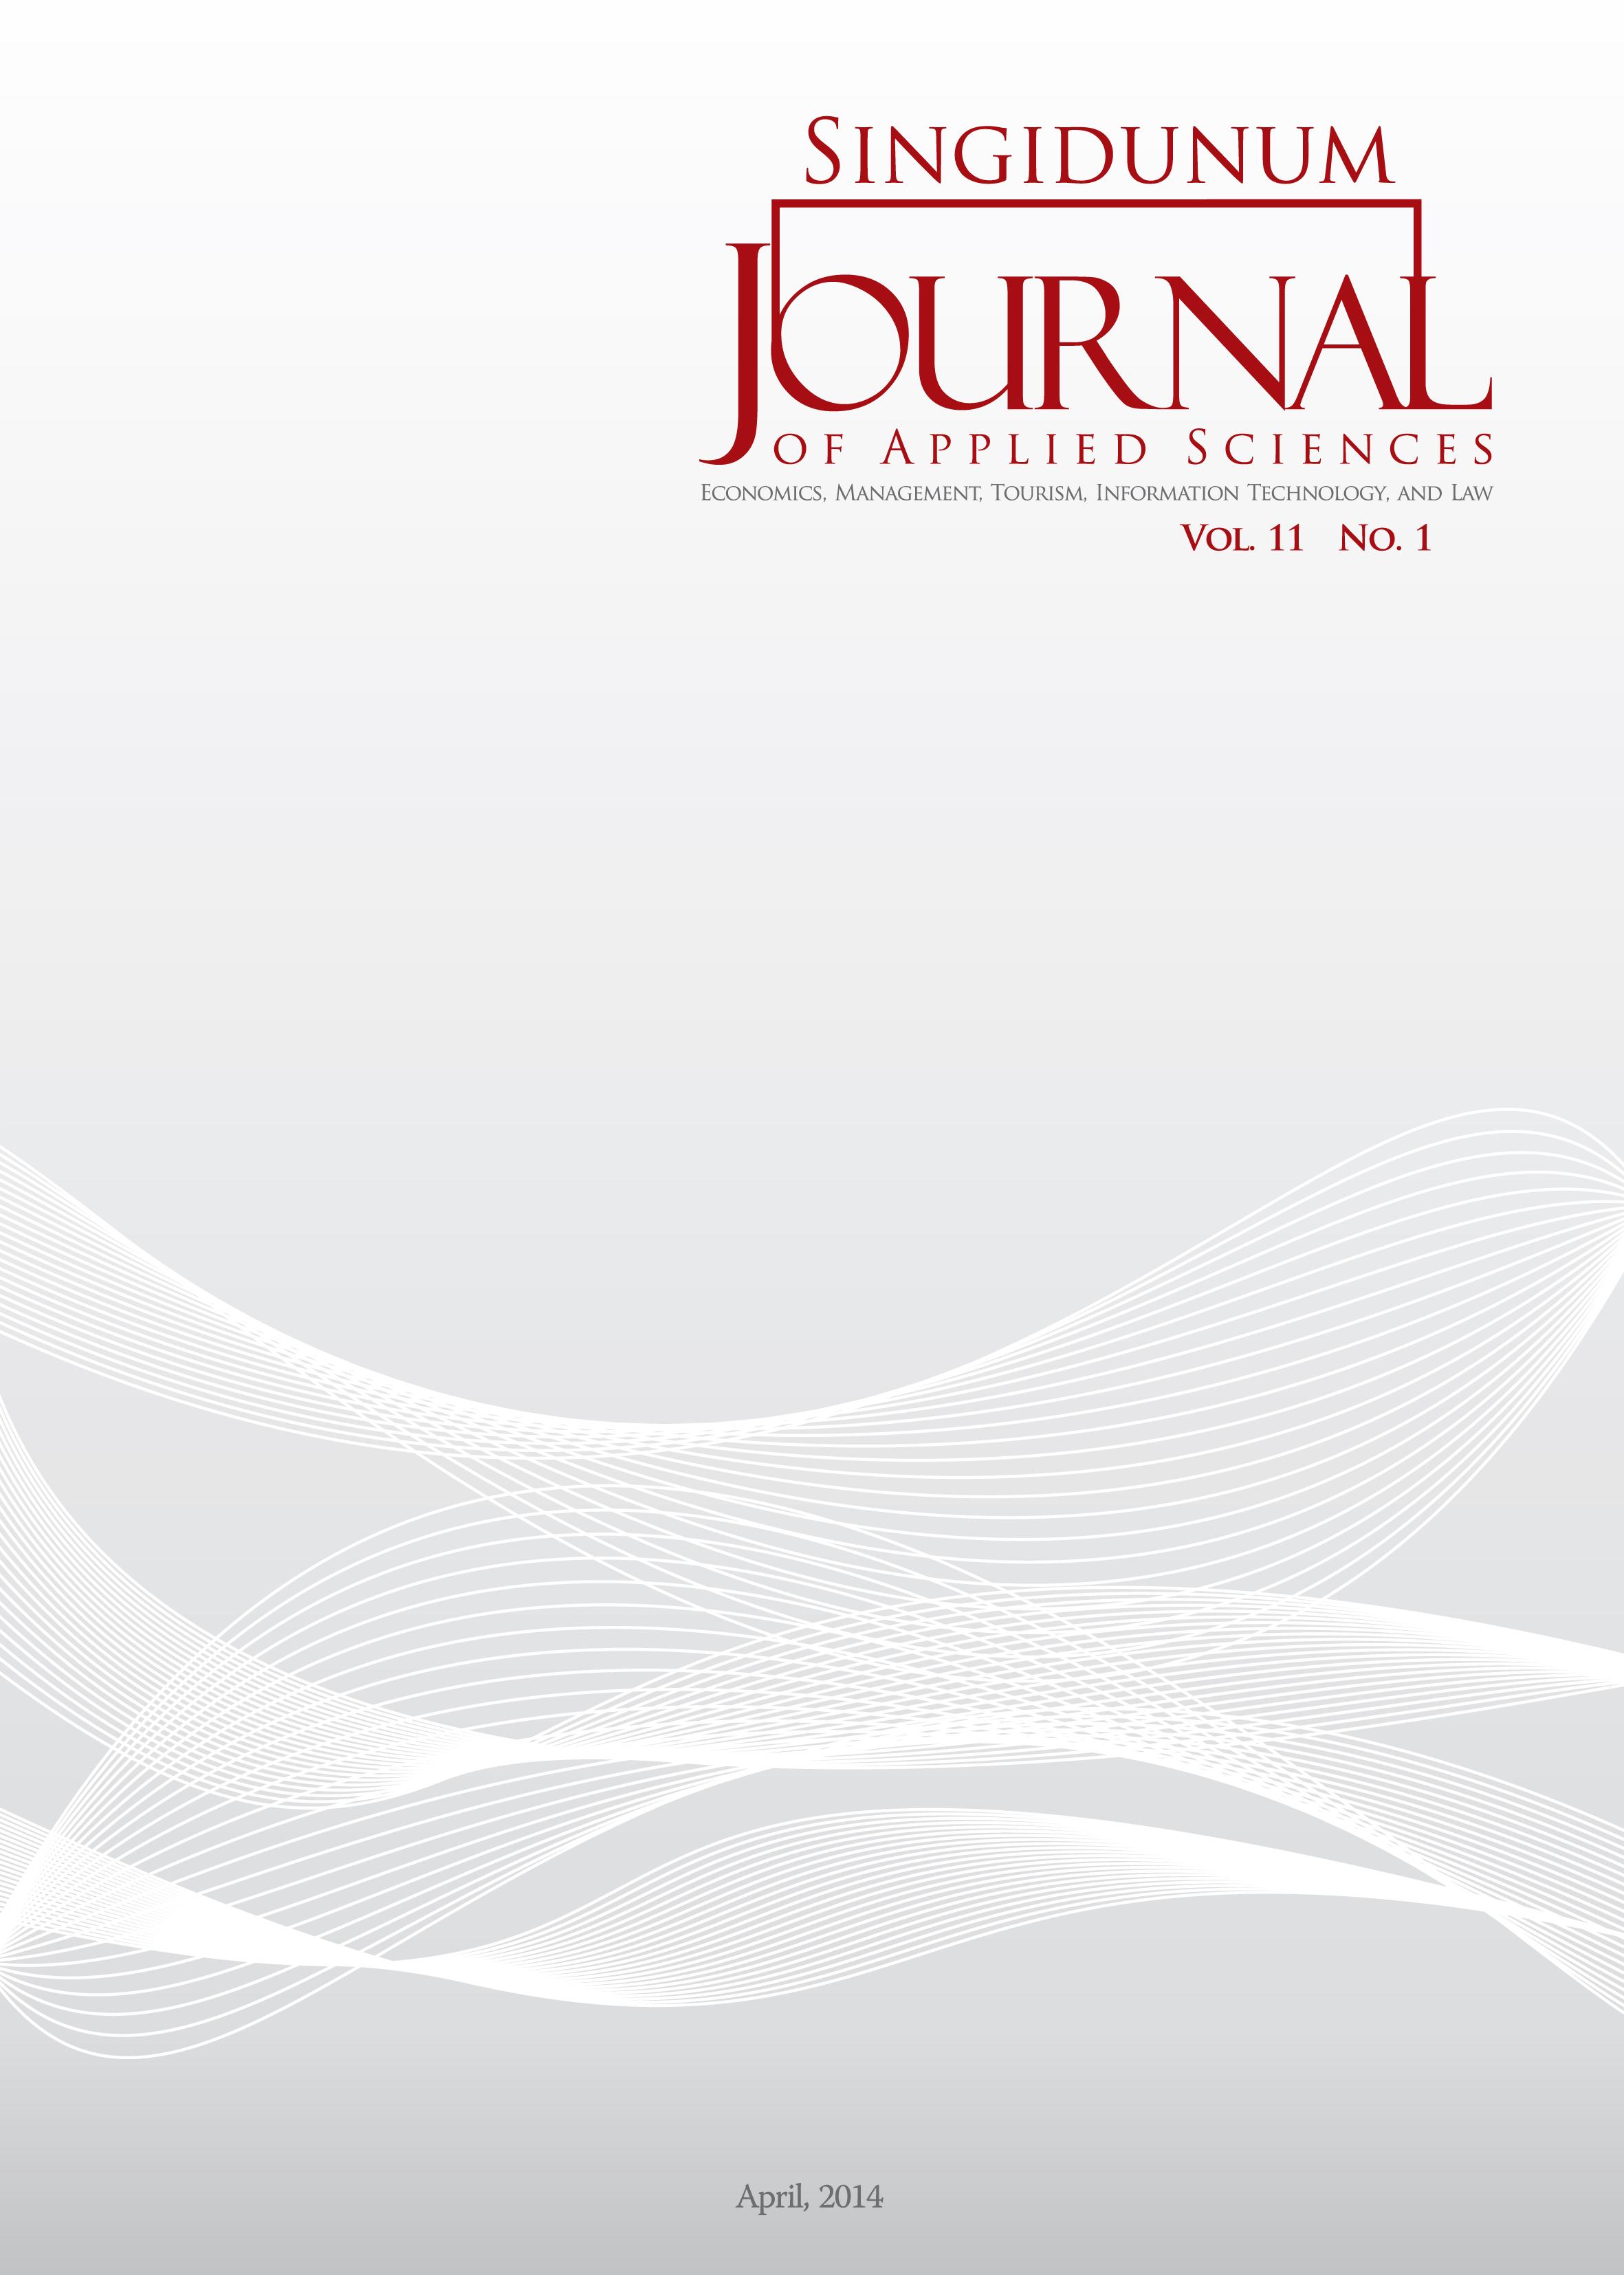 Singidunum Journal of Applied Sciences